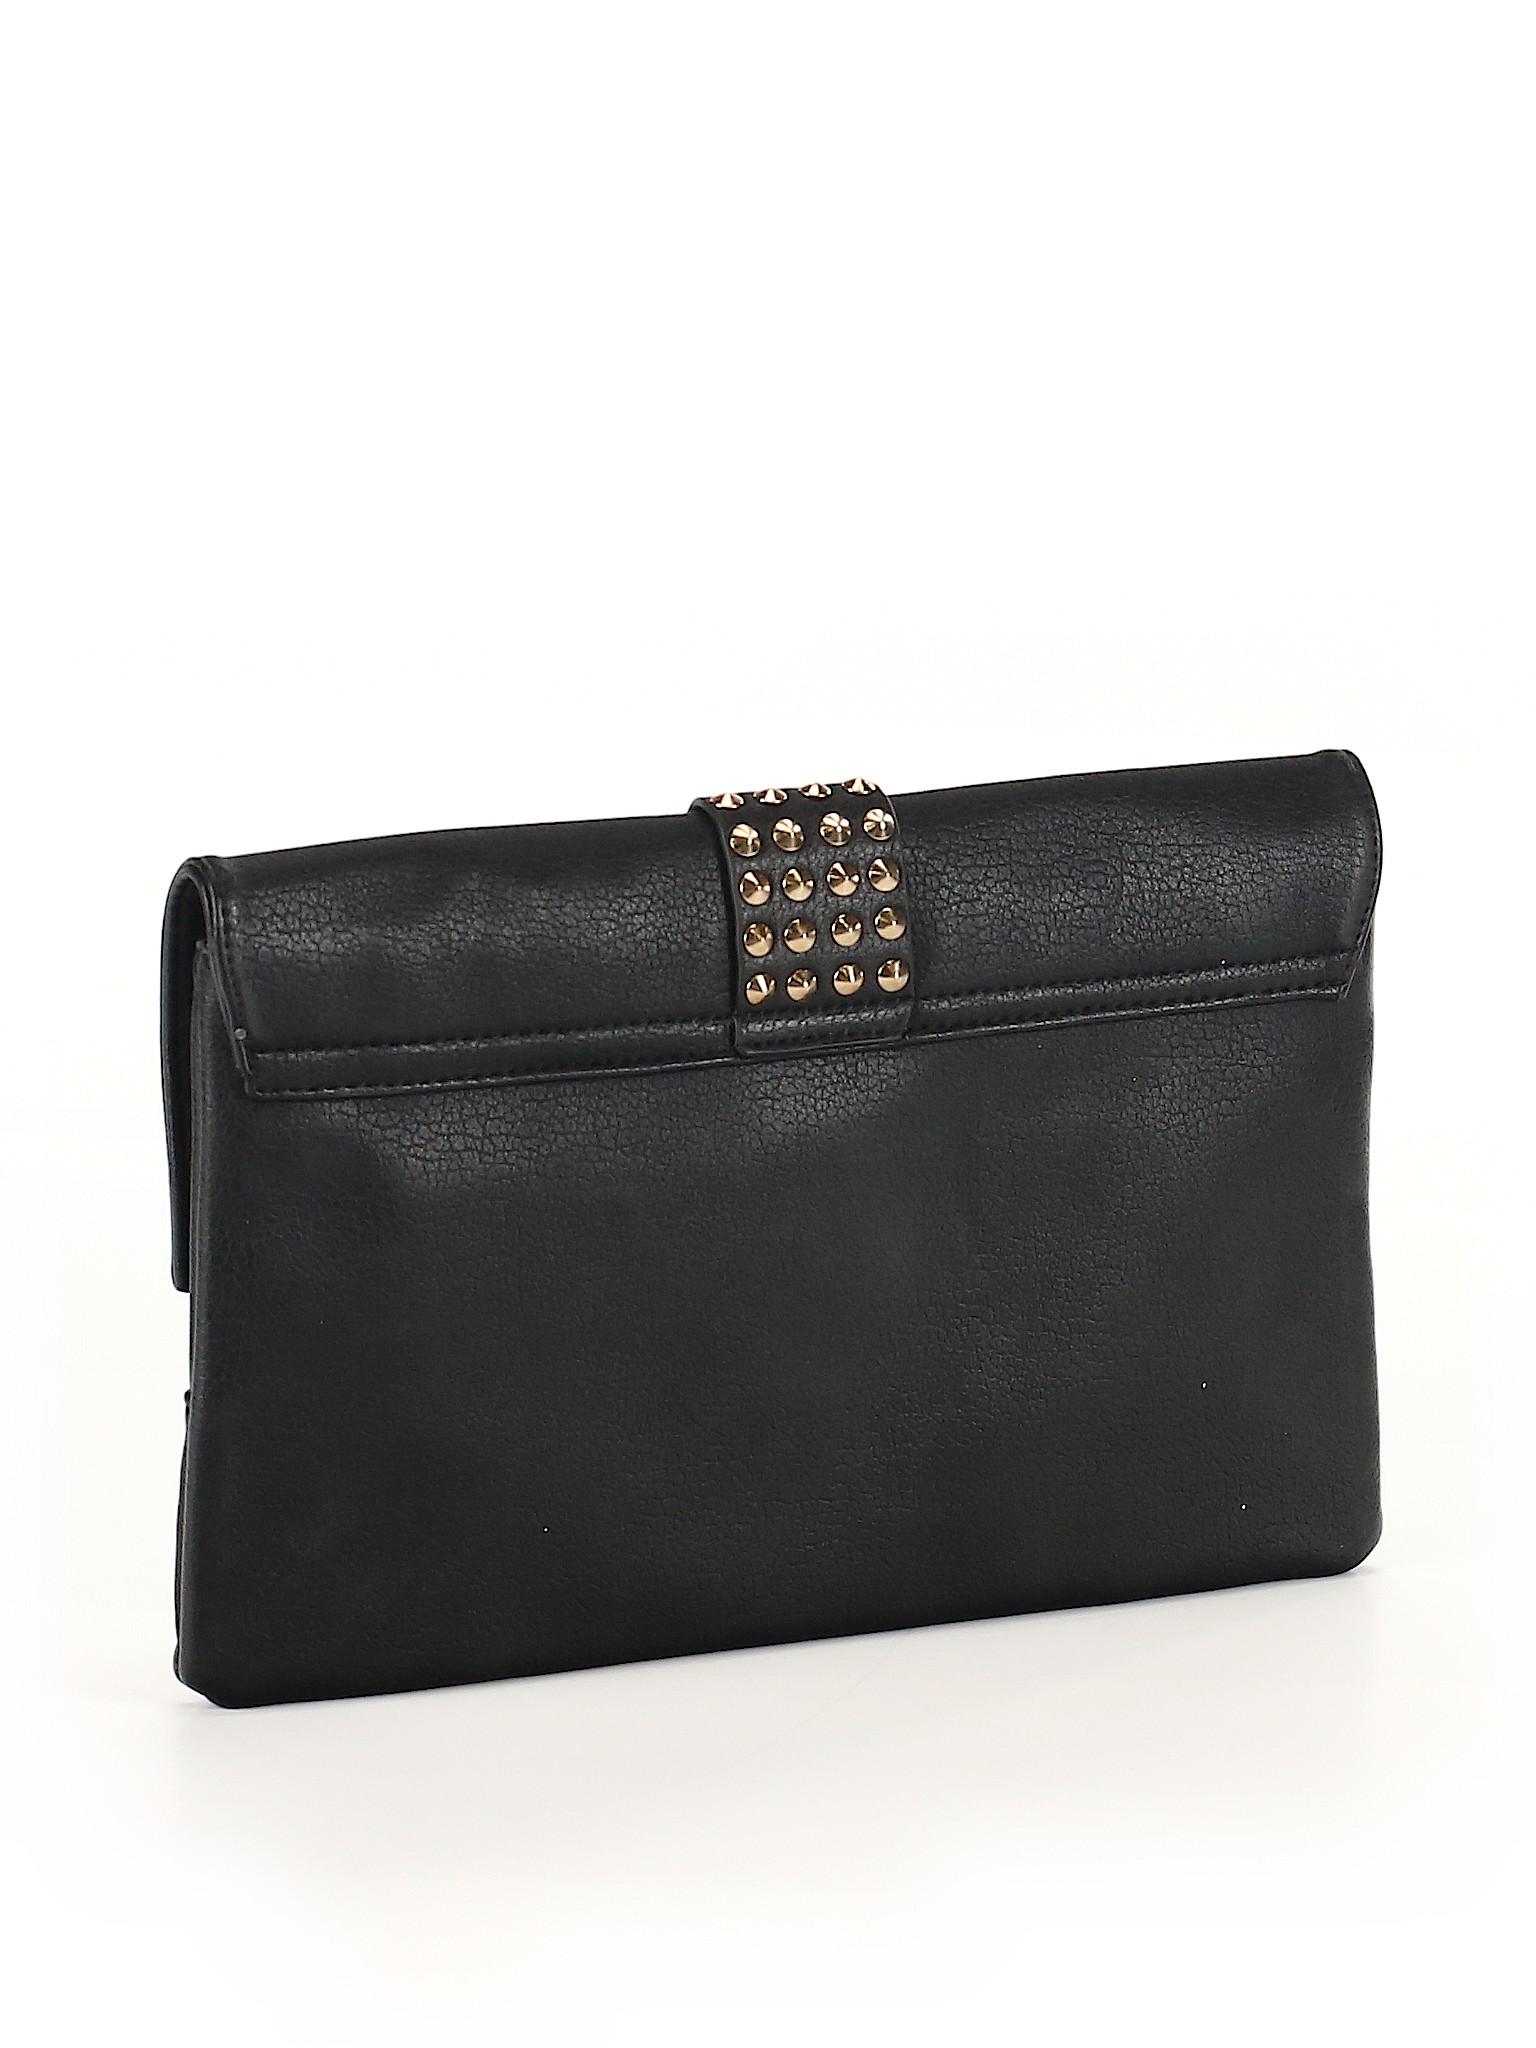 cb5540f5c Yoki Handbags On Sale Up To 90% Off Retail | thredUP